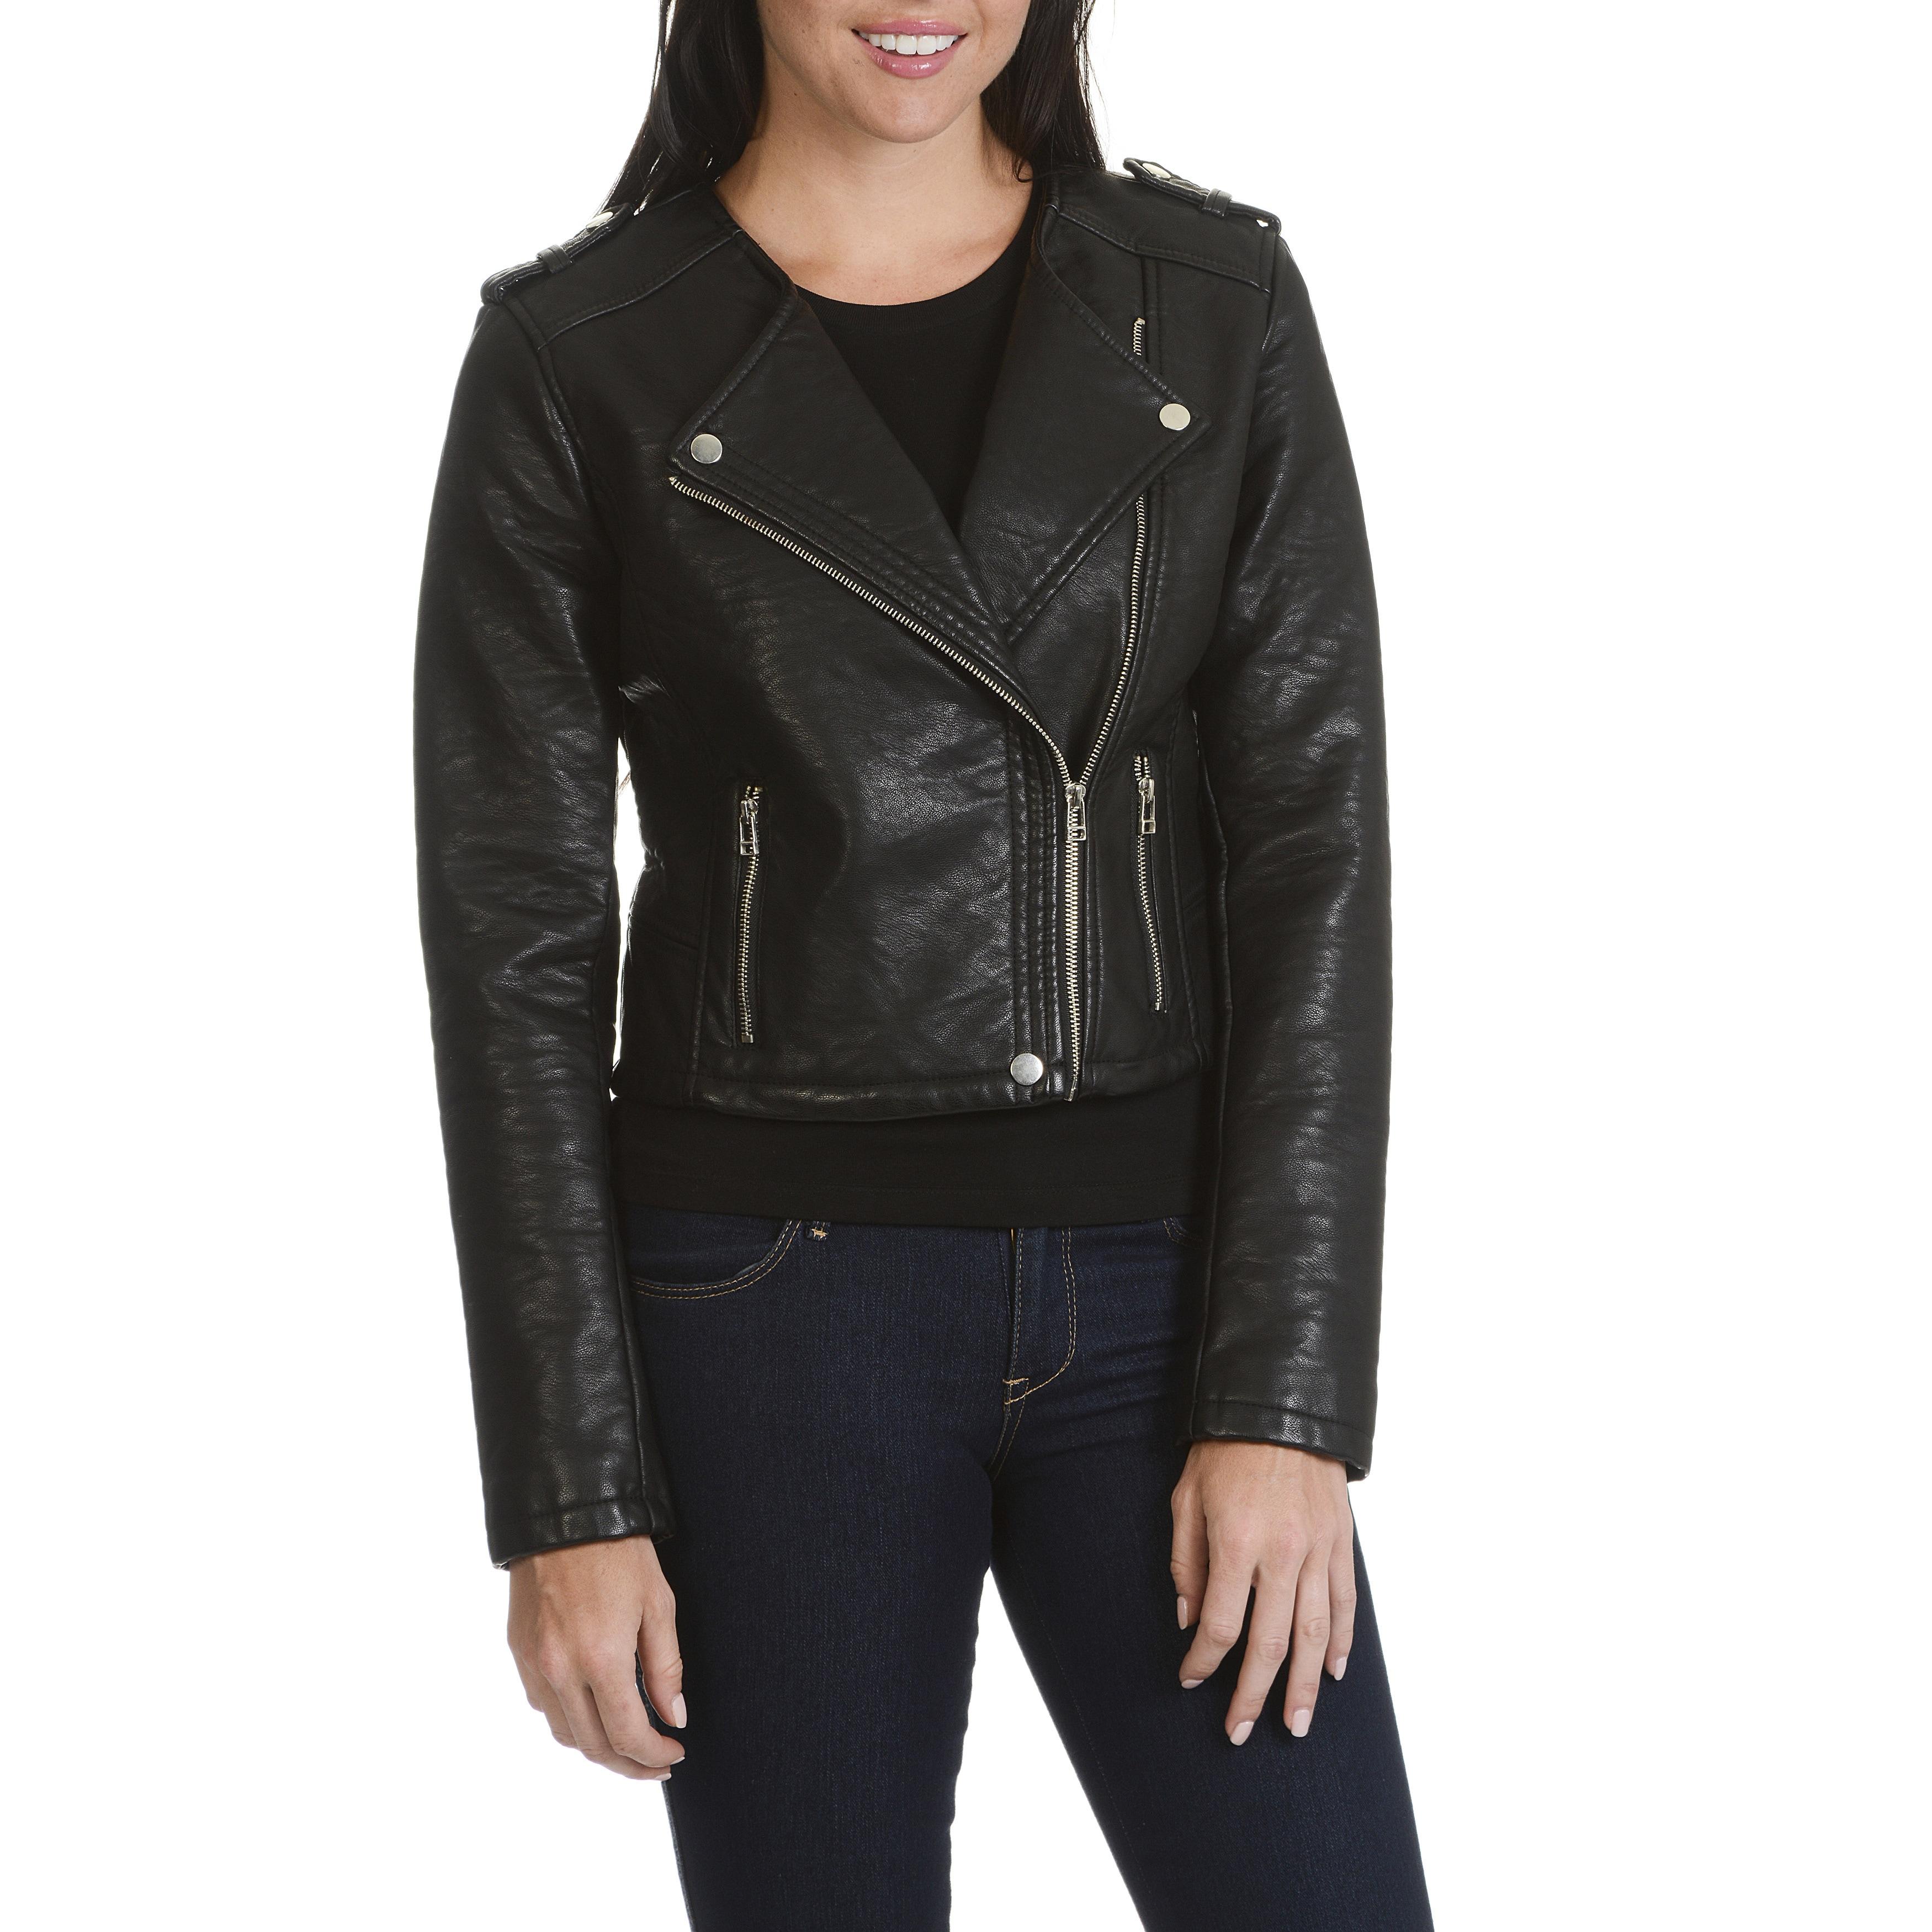 Ashley by 26 International Outerwear Junior Women's Black...